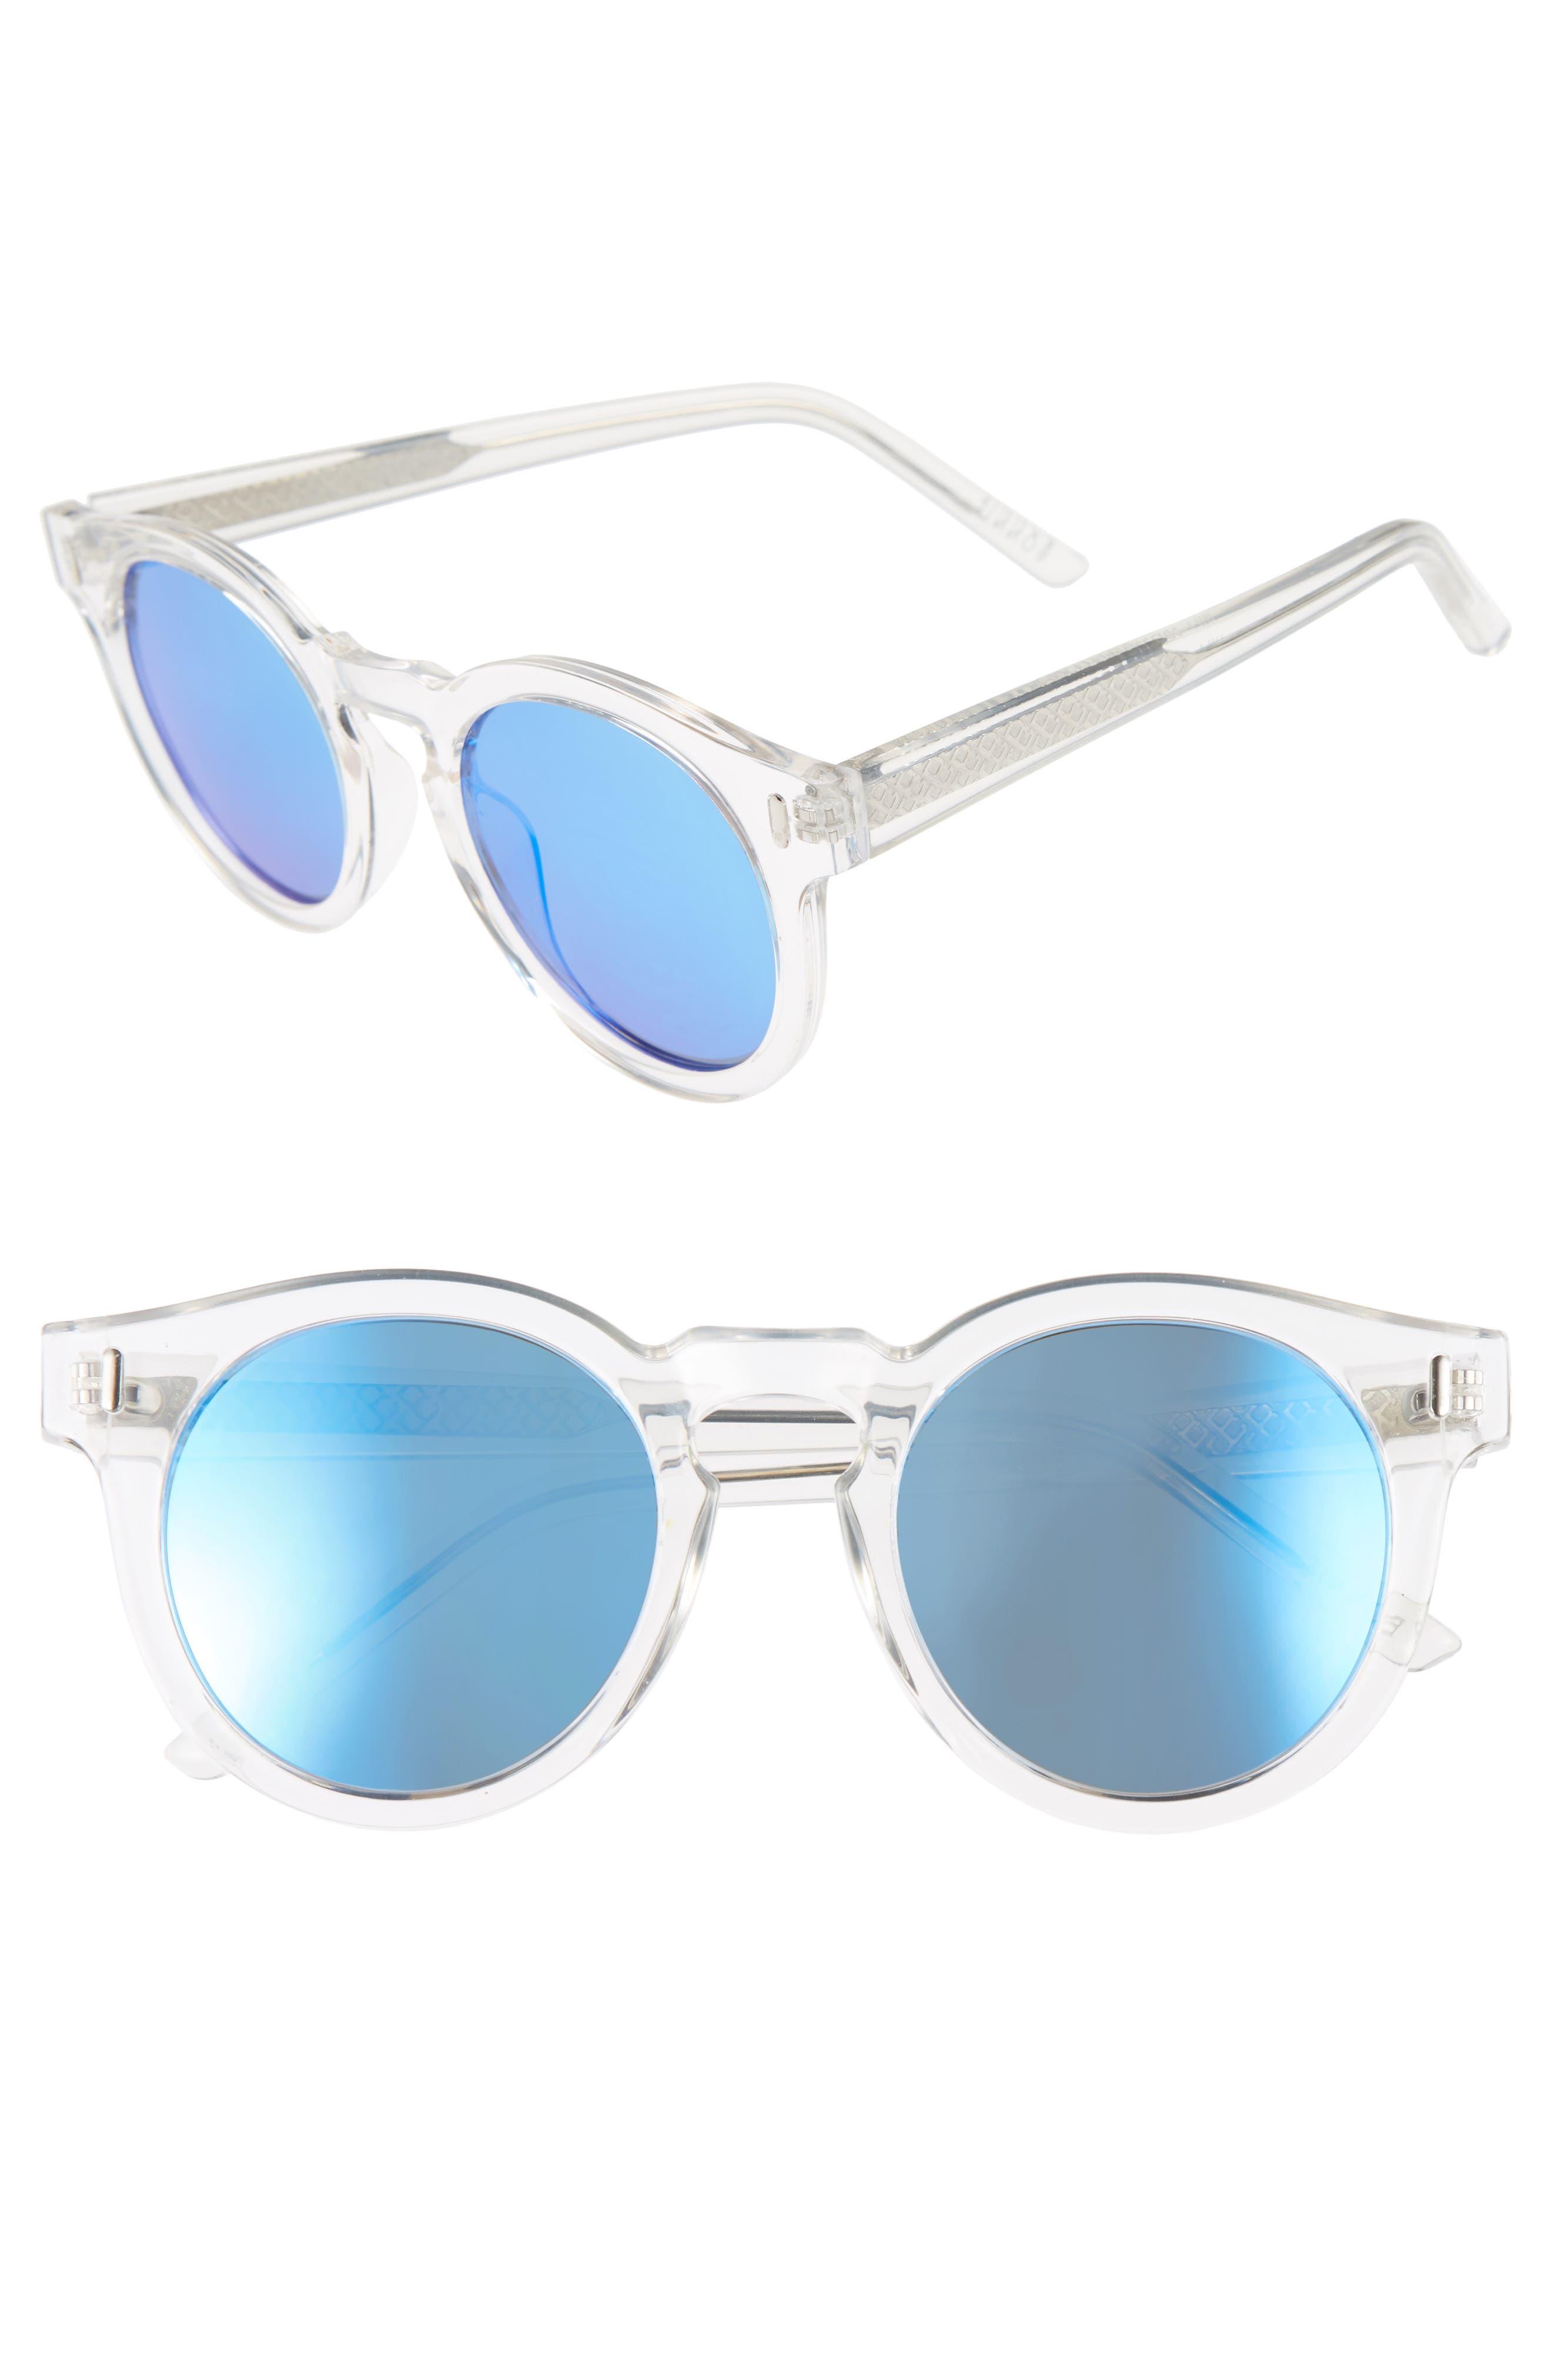 Main Image - Bonnie Clyde Hill 50mm Polarized Sunglasses